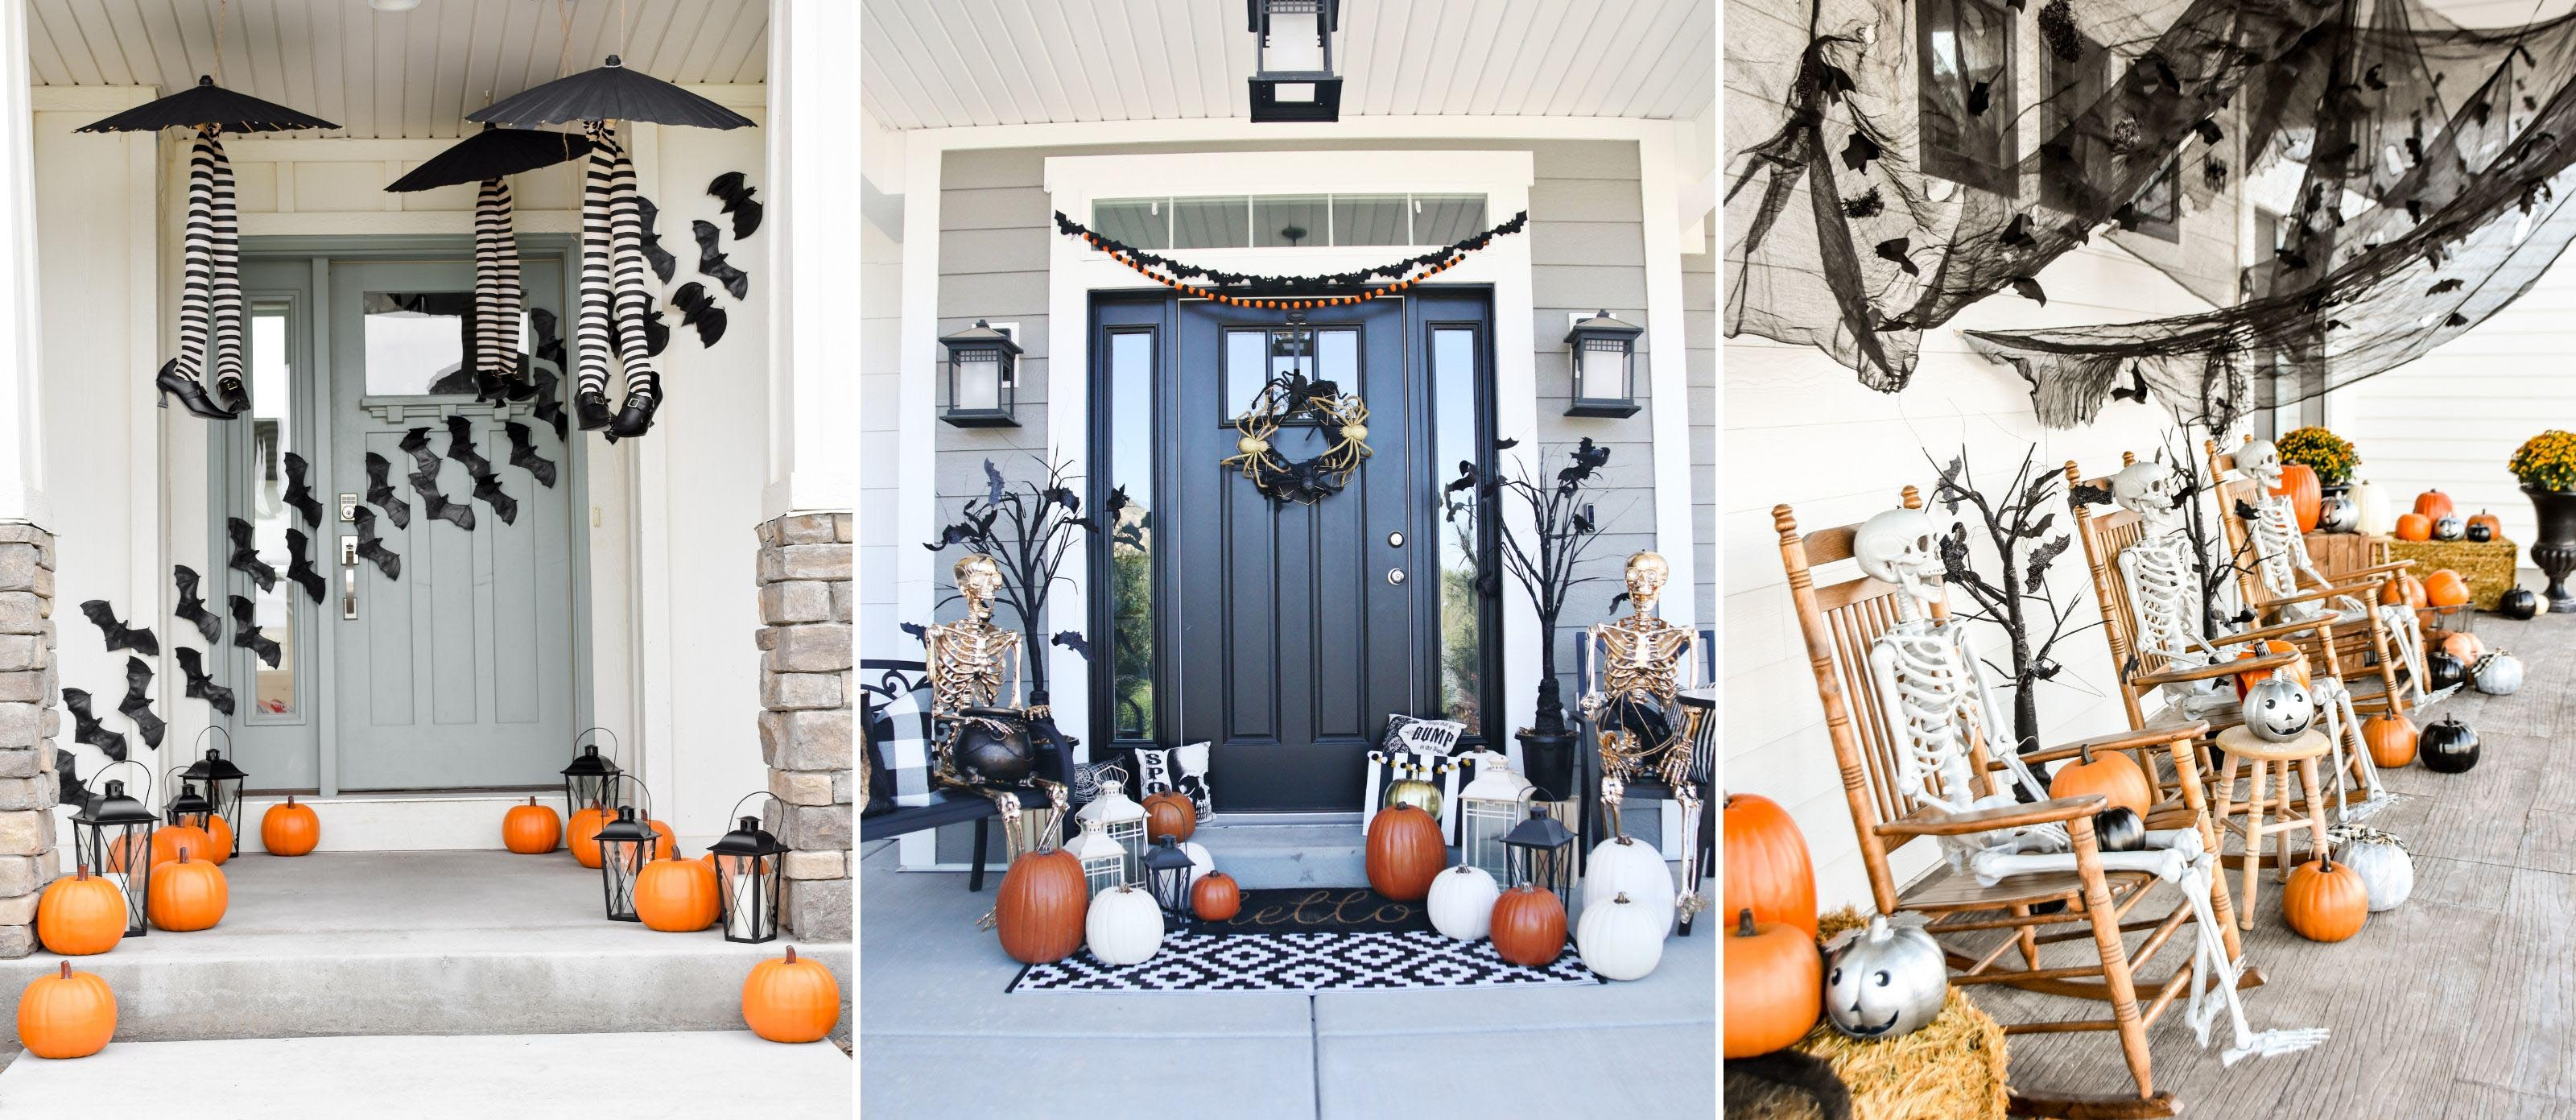 Shop It Front Porch Halloween Decor Ideas Fun365